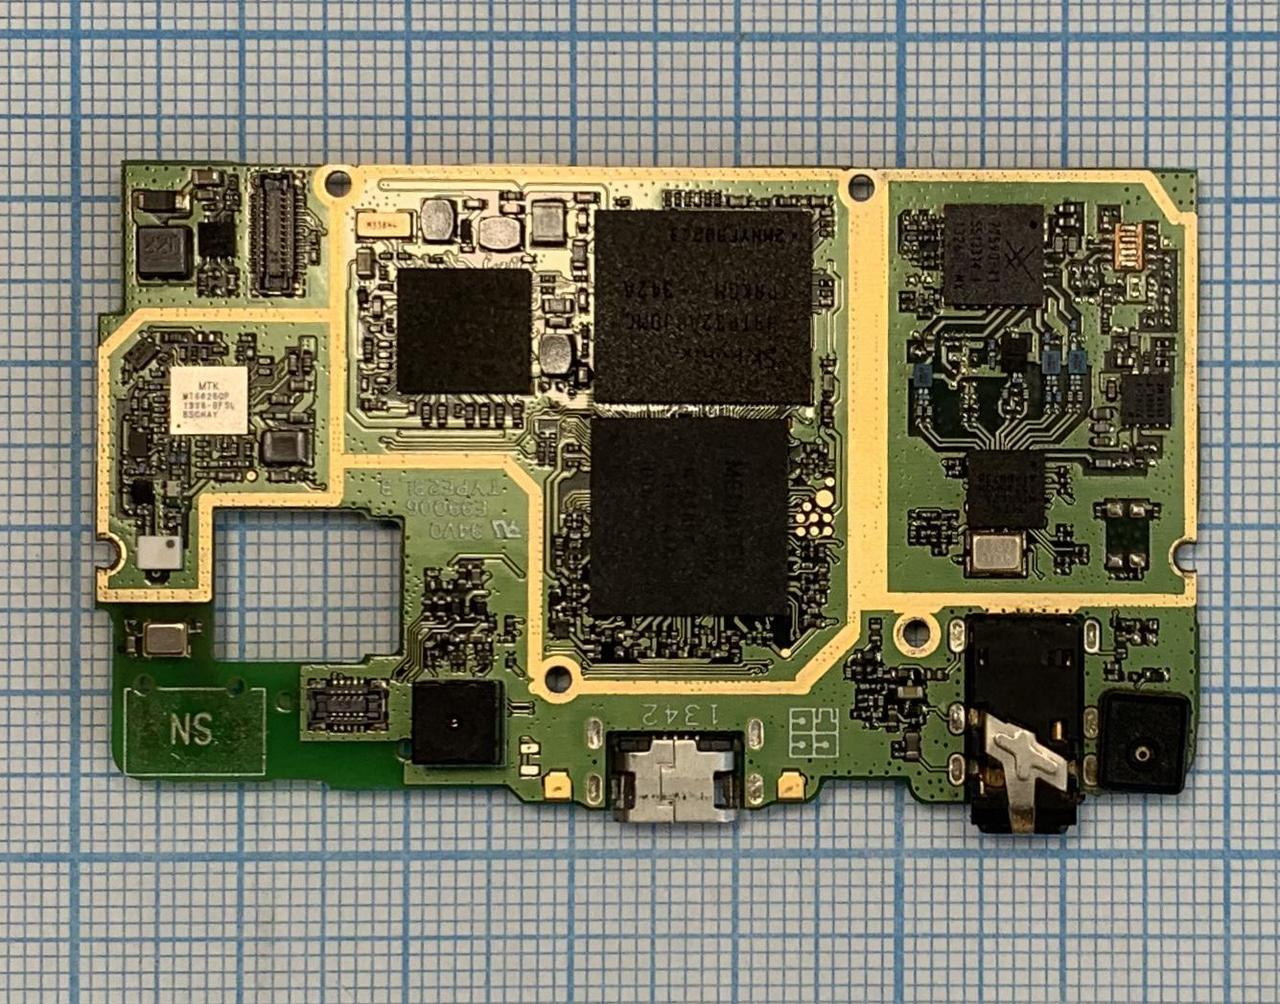 Системна плата Lenovo P780 (Не робоча) (Prada-MB-H401) б/в